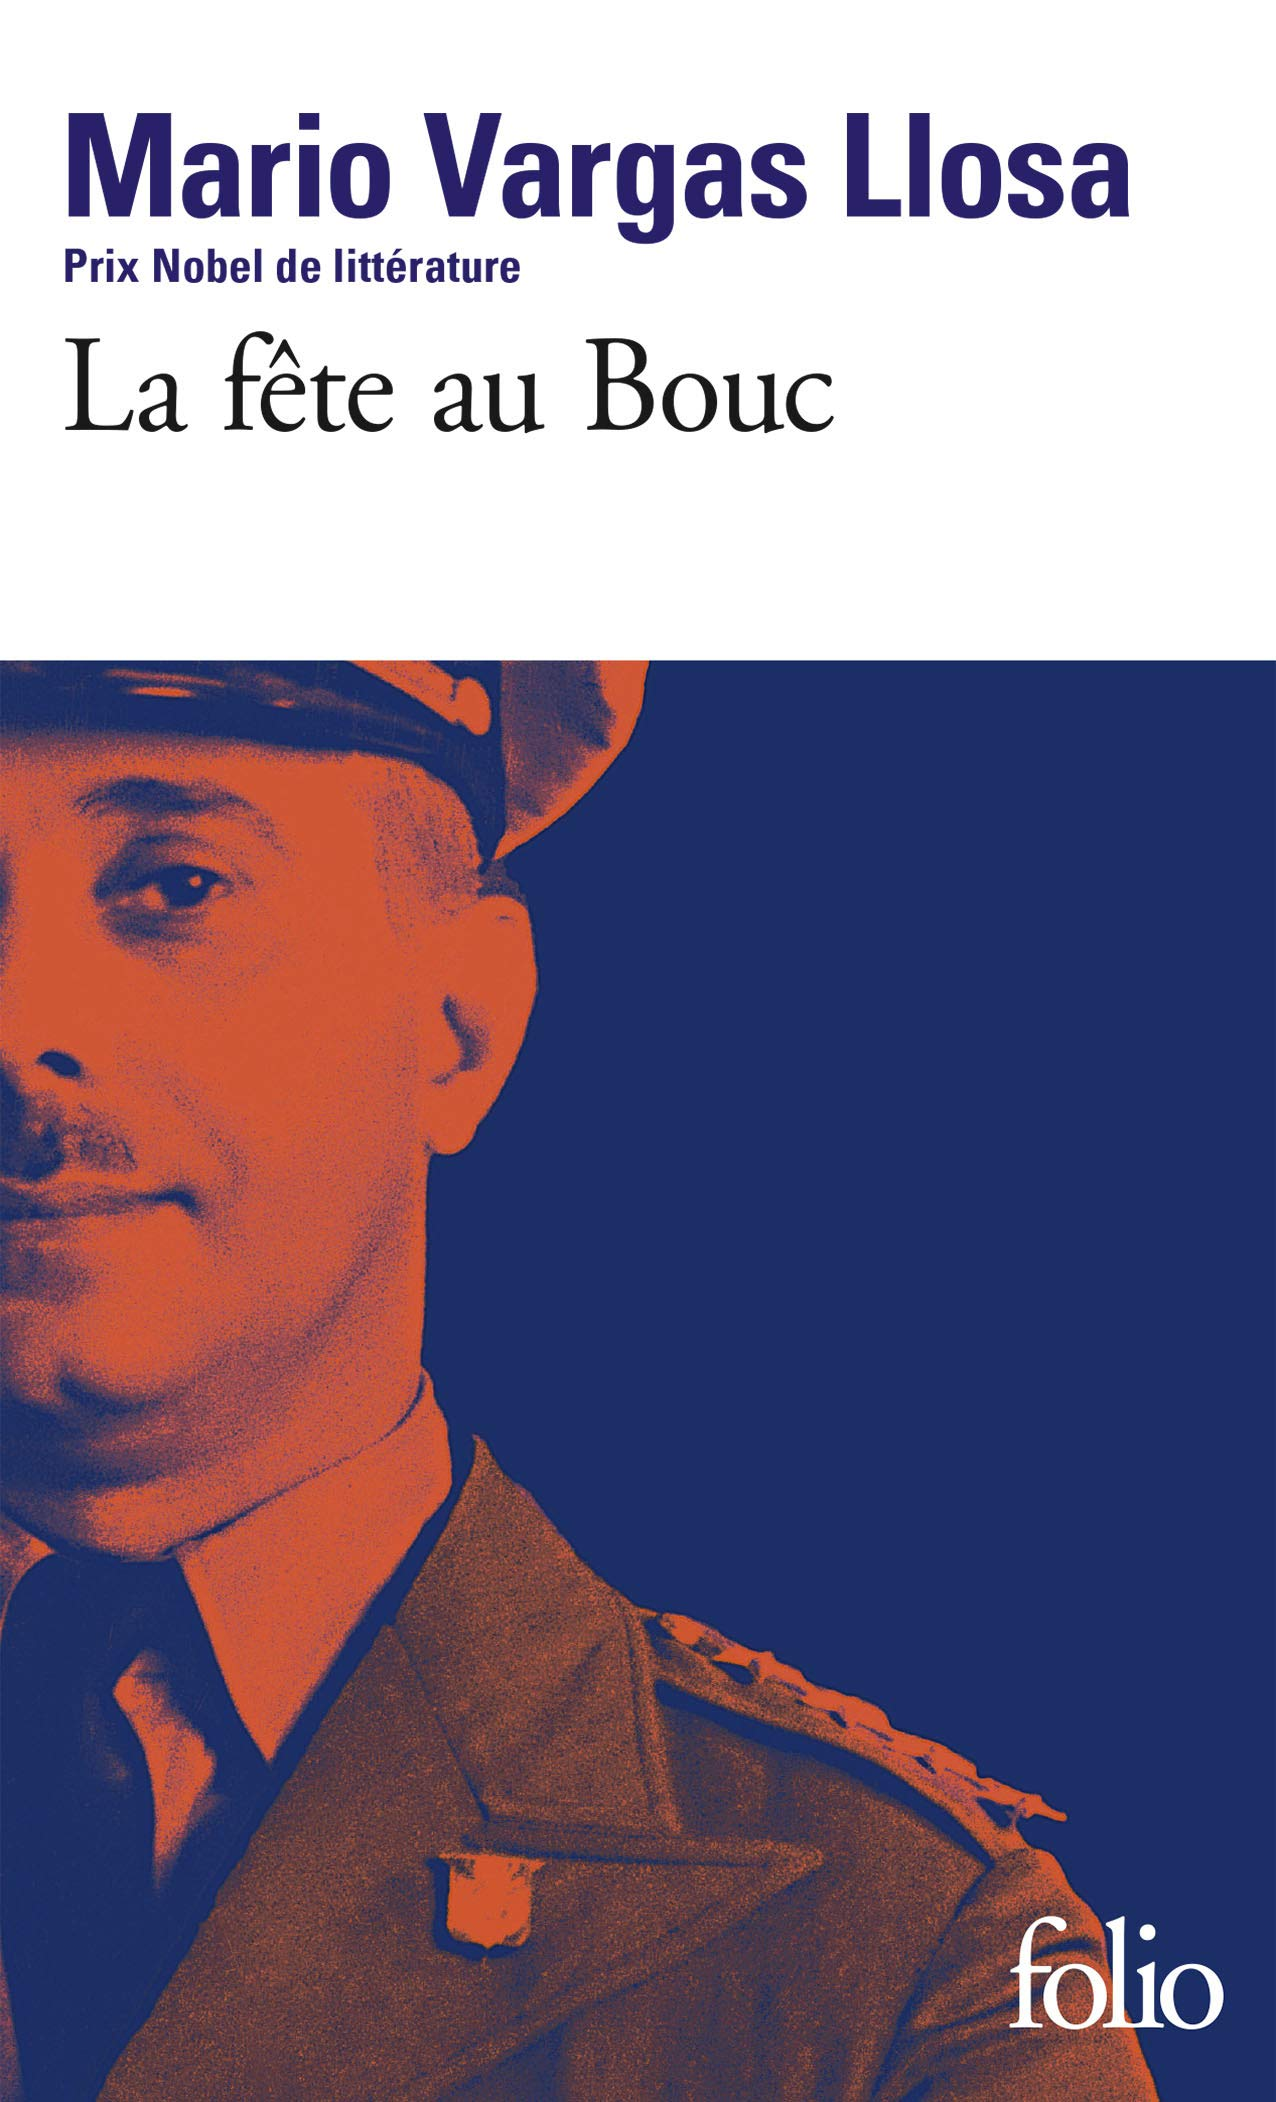 La-fête-au-Bouc-Mario-Vargas-Llosa-culturclub.jpg